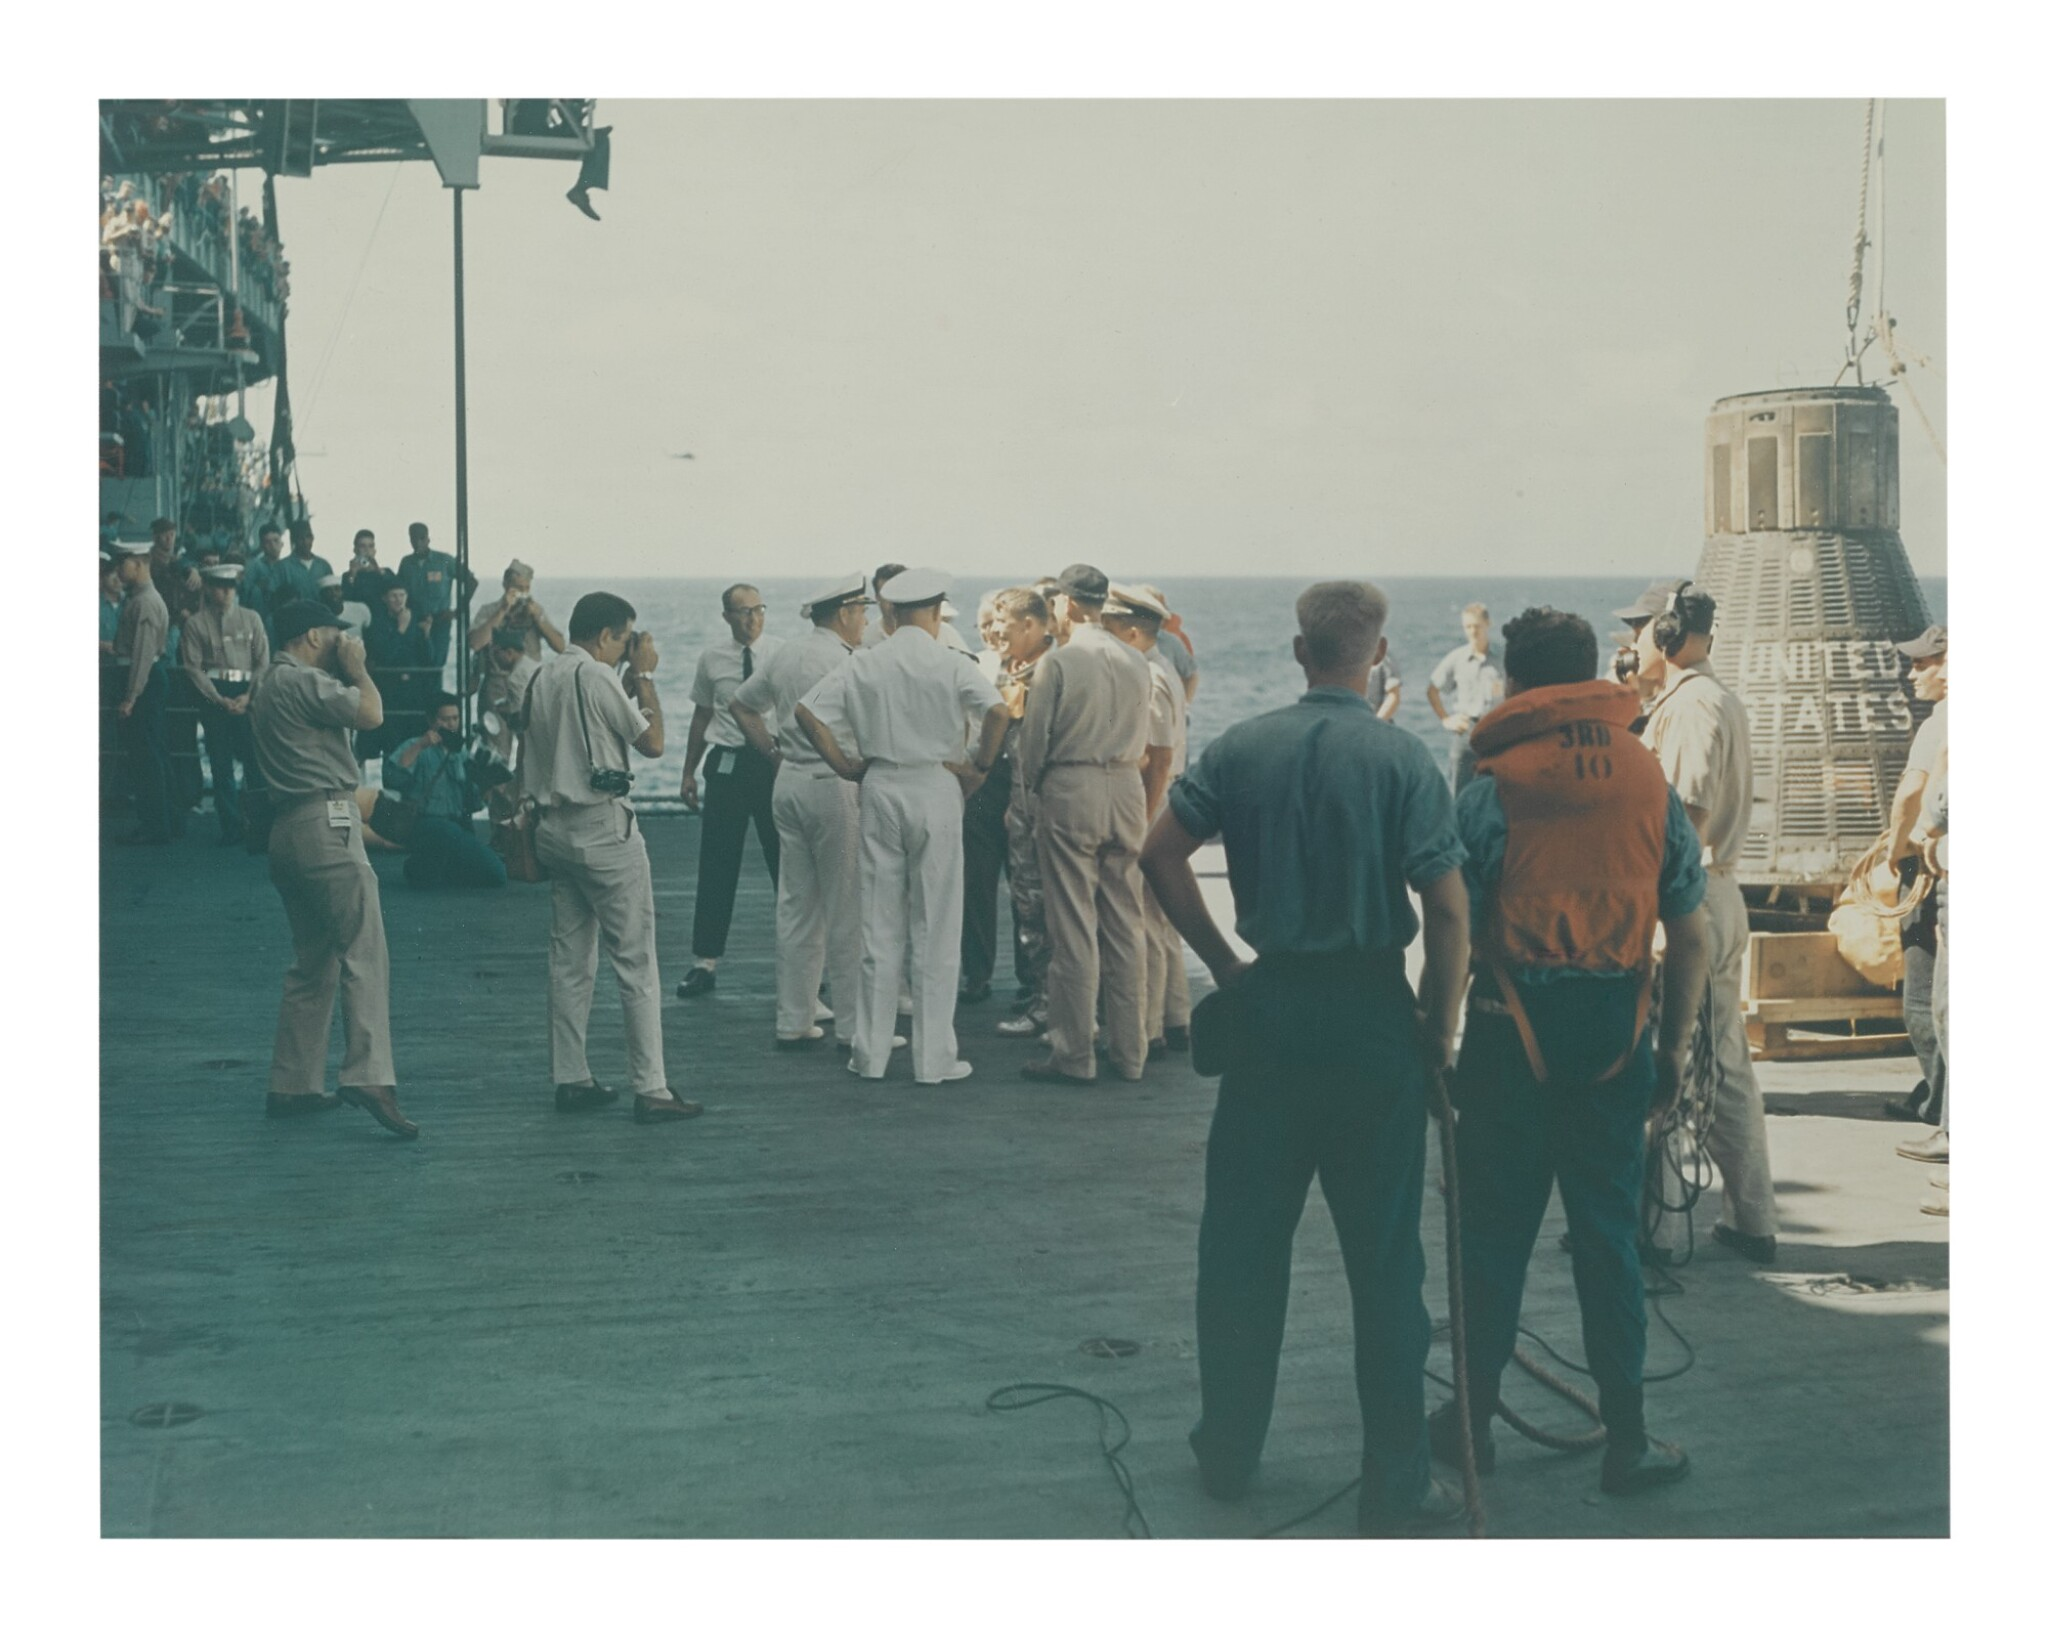 [MERCURY-ATLAS 8] VINTAGE CHROMOGENIC PRINT OF WALLY SCHIRRA ABOARD THE USS KEARSARGE AFTER SPLASHDOWN, 3 OCTOBER 1962.